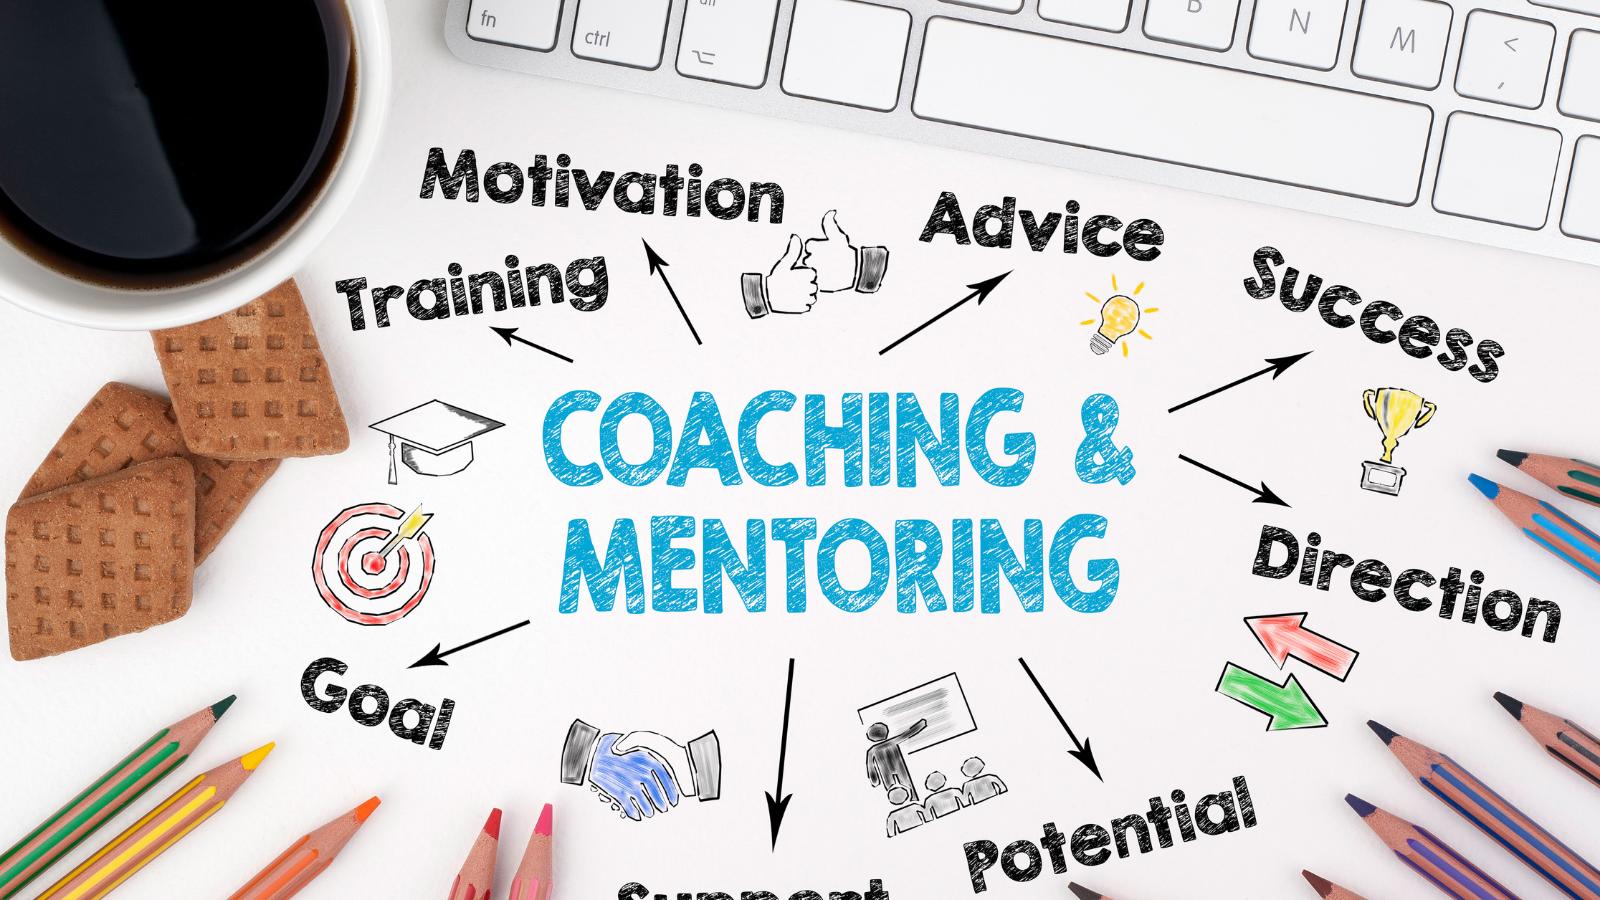 Talent Development - Coaching vs Mentoring